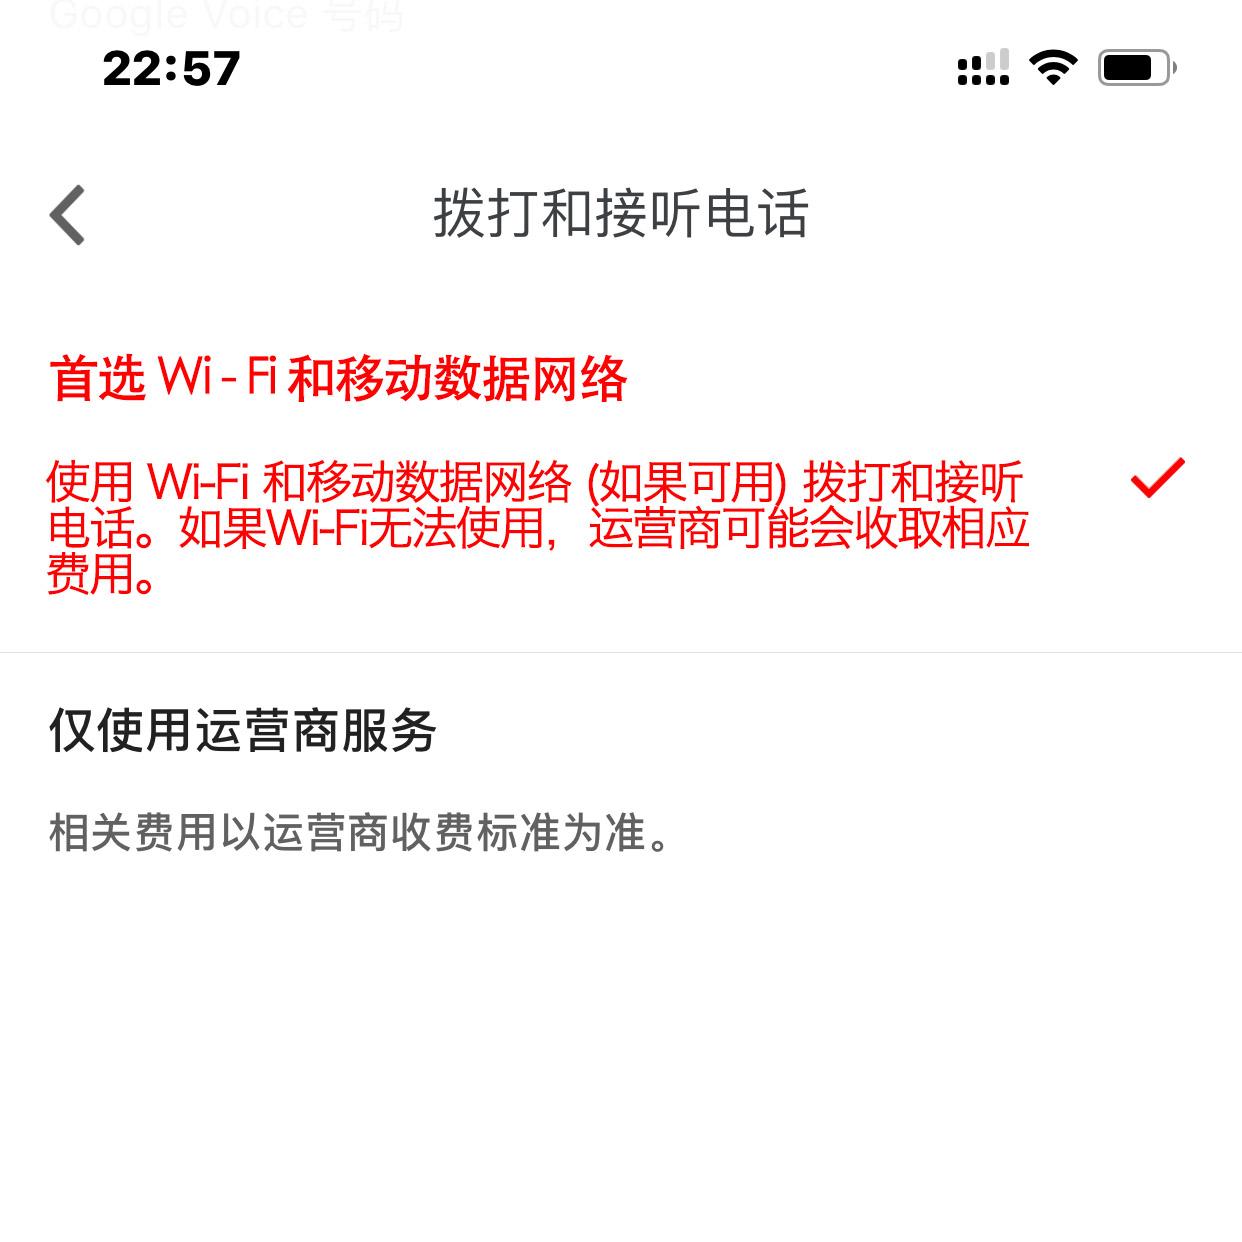 Google Voice首选Wi-Fi和移动数据网络